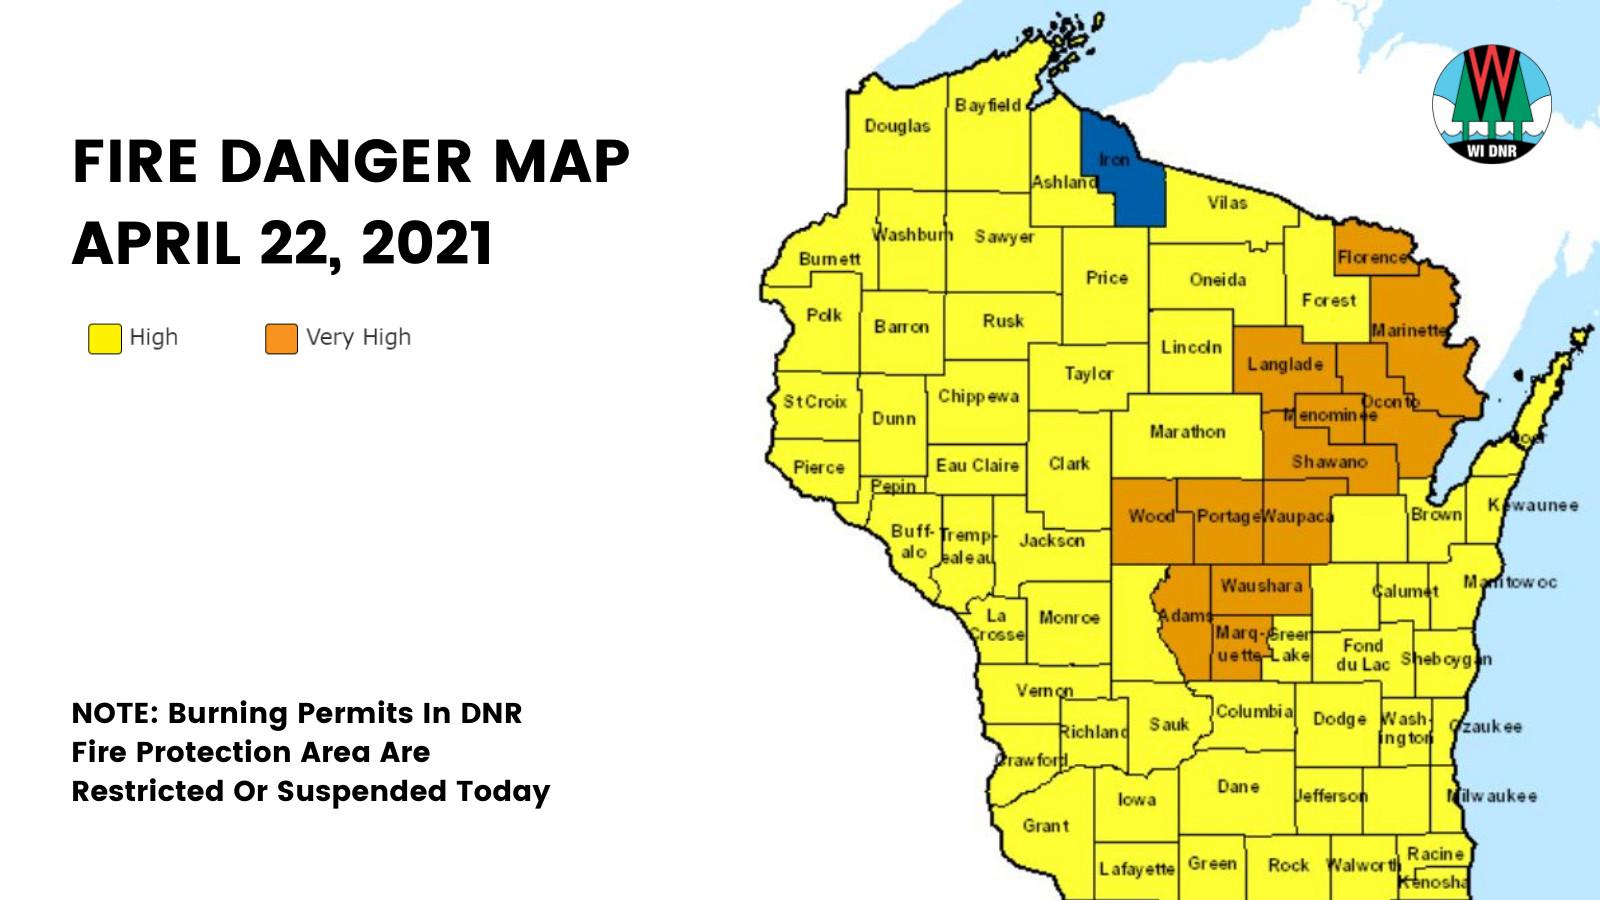 map of fire danger in Wisconsin